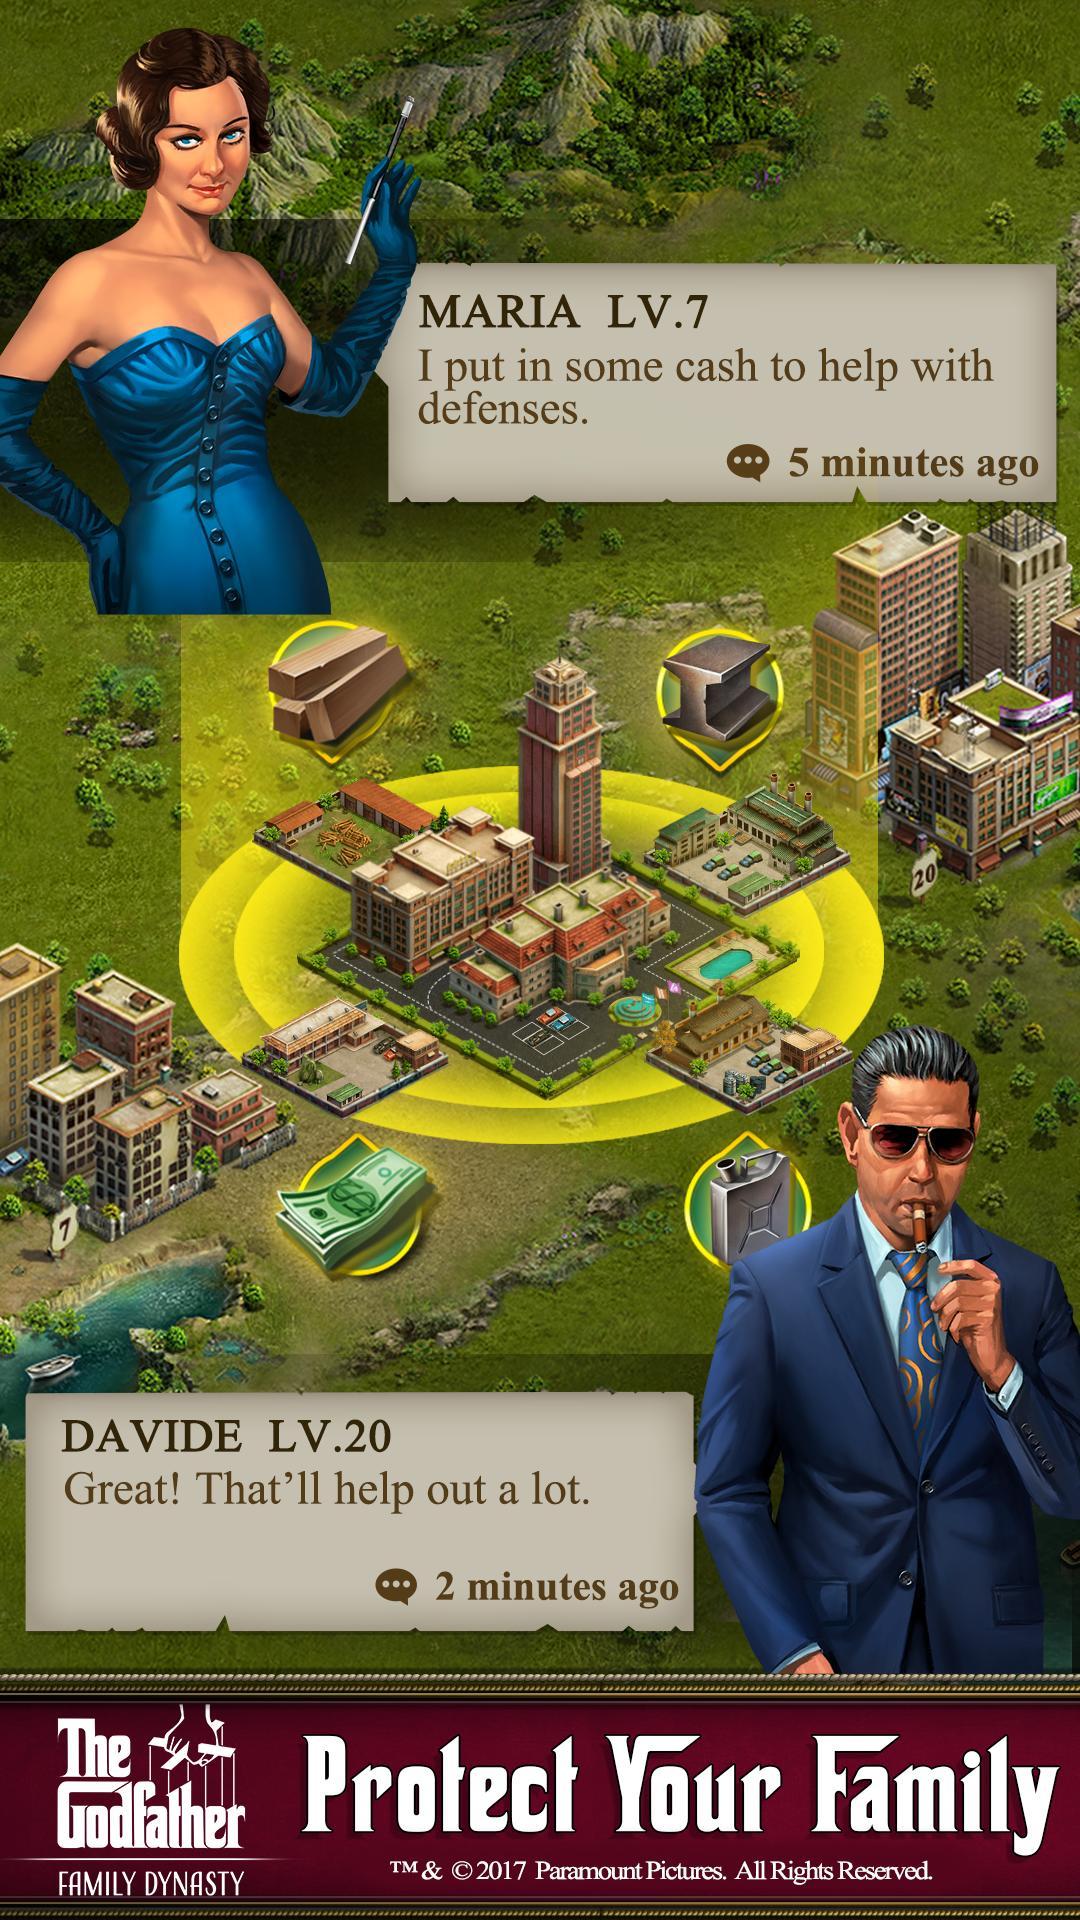 The Godfather: Family Dynasty 1.86 Screenshot 10